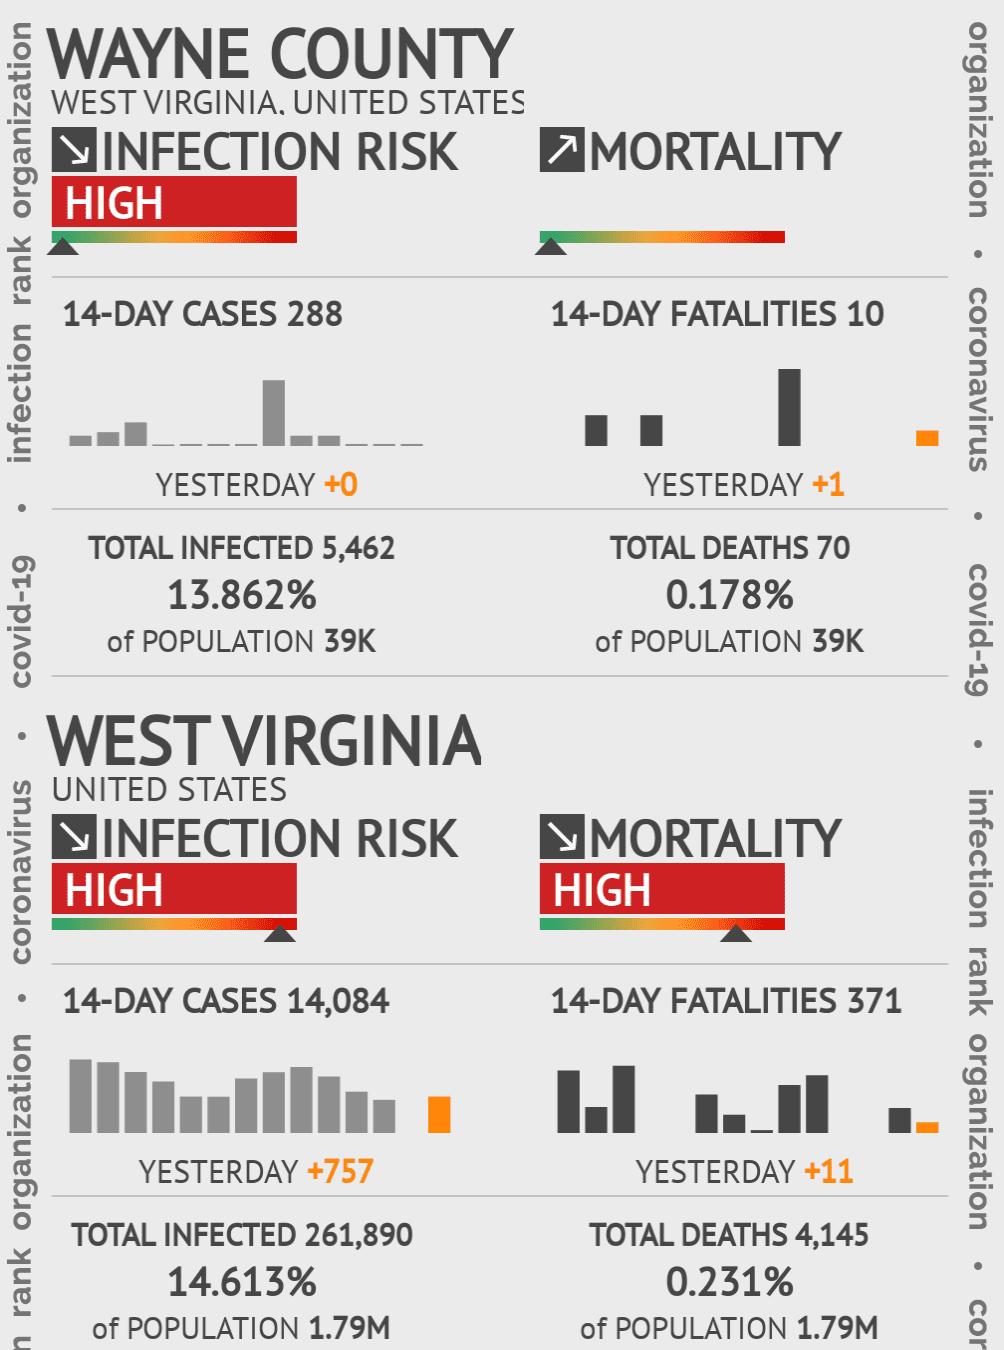 Wayne County Coronavirus Covid-19 Risk of Infection on July 24, 2021